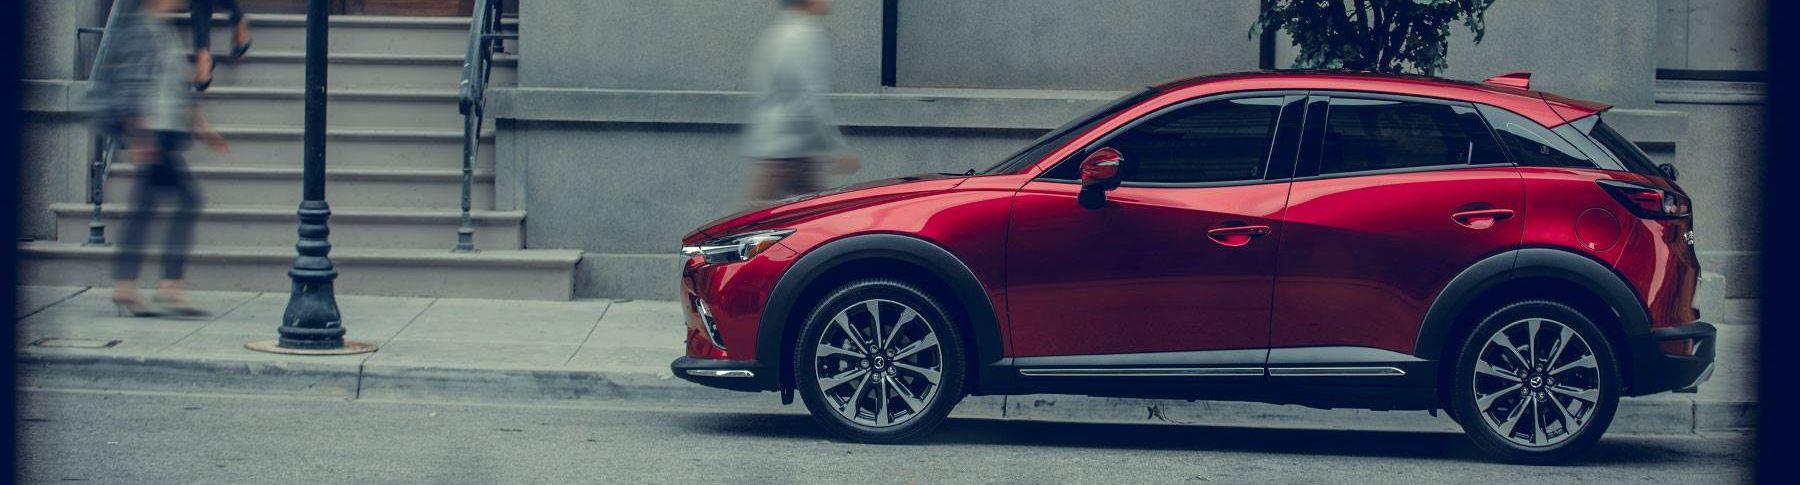 2019 Mazda CX-3 Financing near Temple, TX